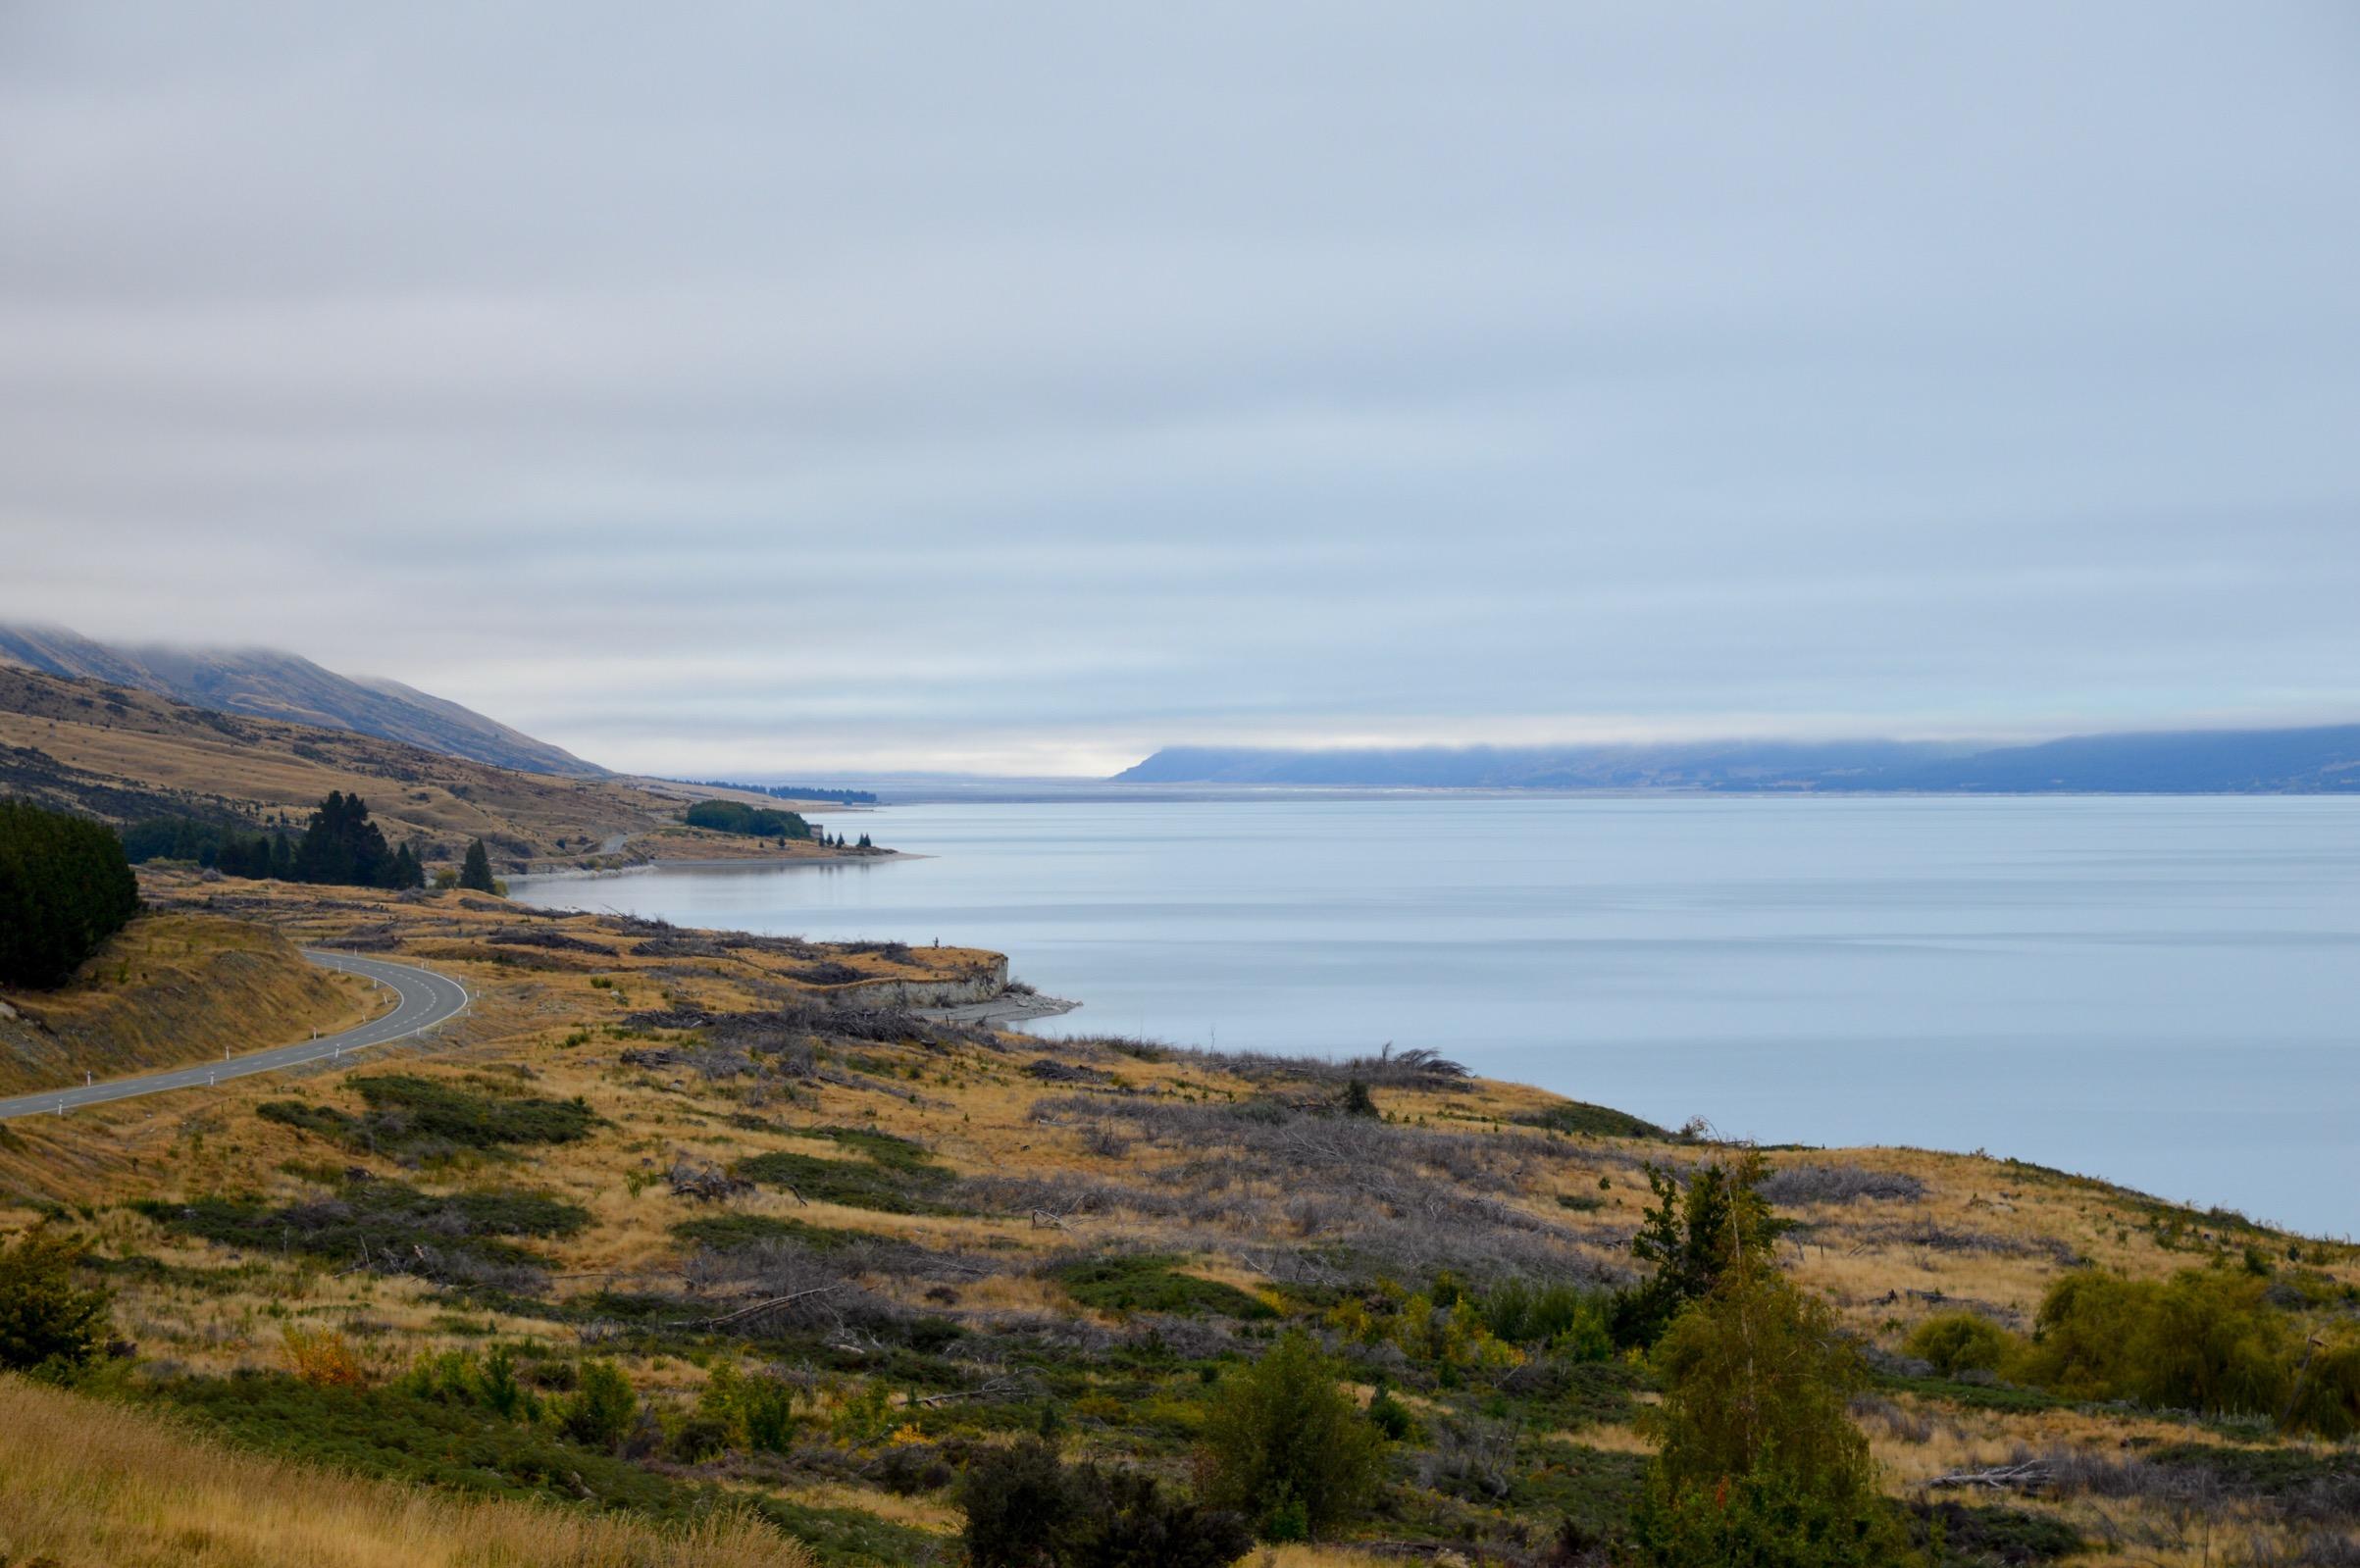 Lake Pukaki, Aoraki/Mount Cook National Park, New Zealand